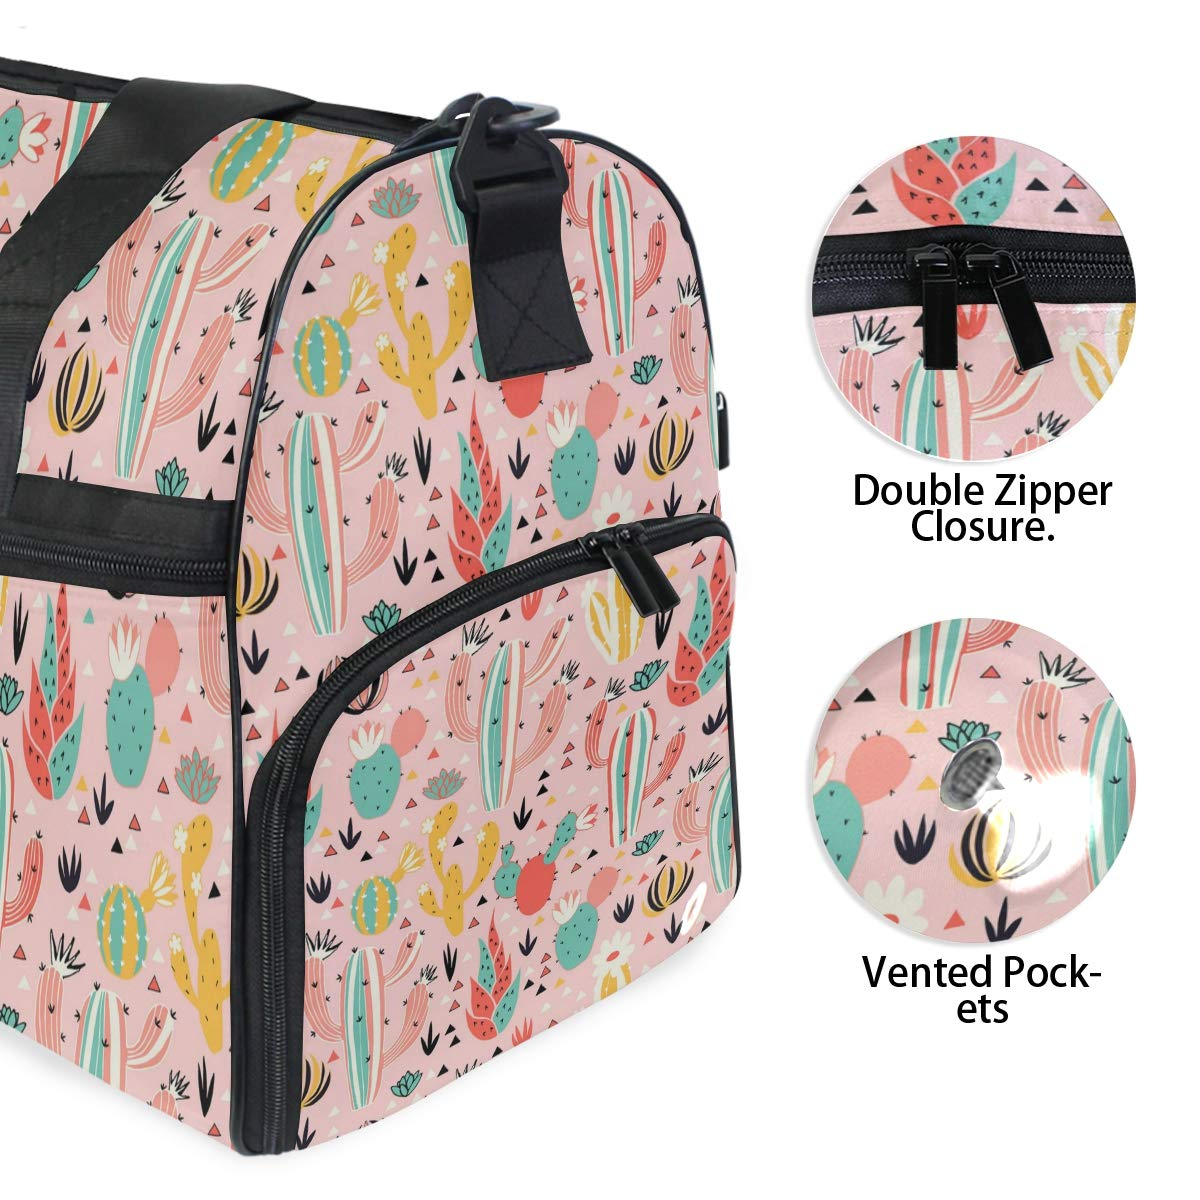 Cute Pink Cactus Flower Large Travel Duffel Bag For Women Men Overnight Weekend Lightweight Luggage Bag